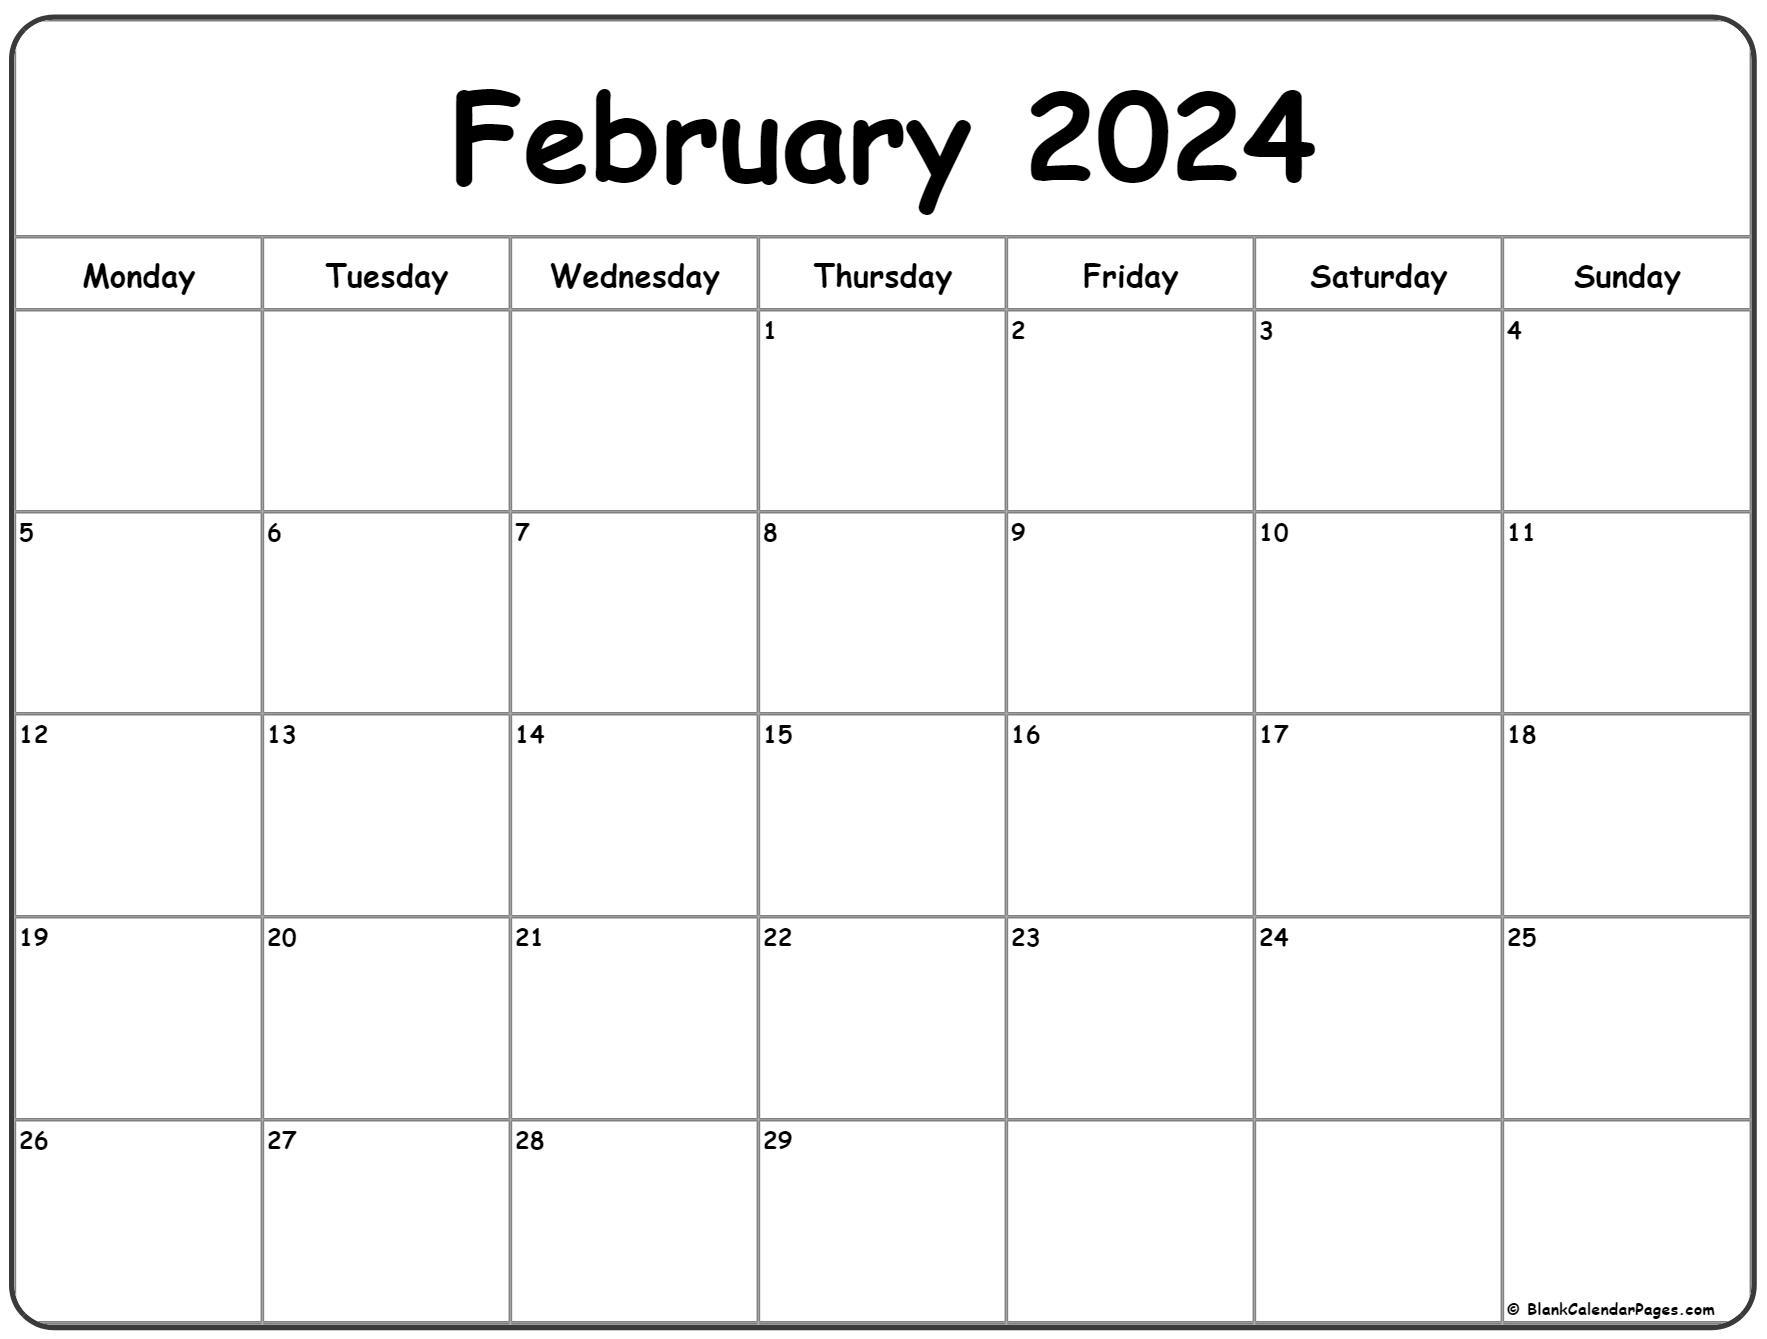 February 2024 Monday calendar. Monday to Sunday